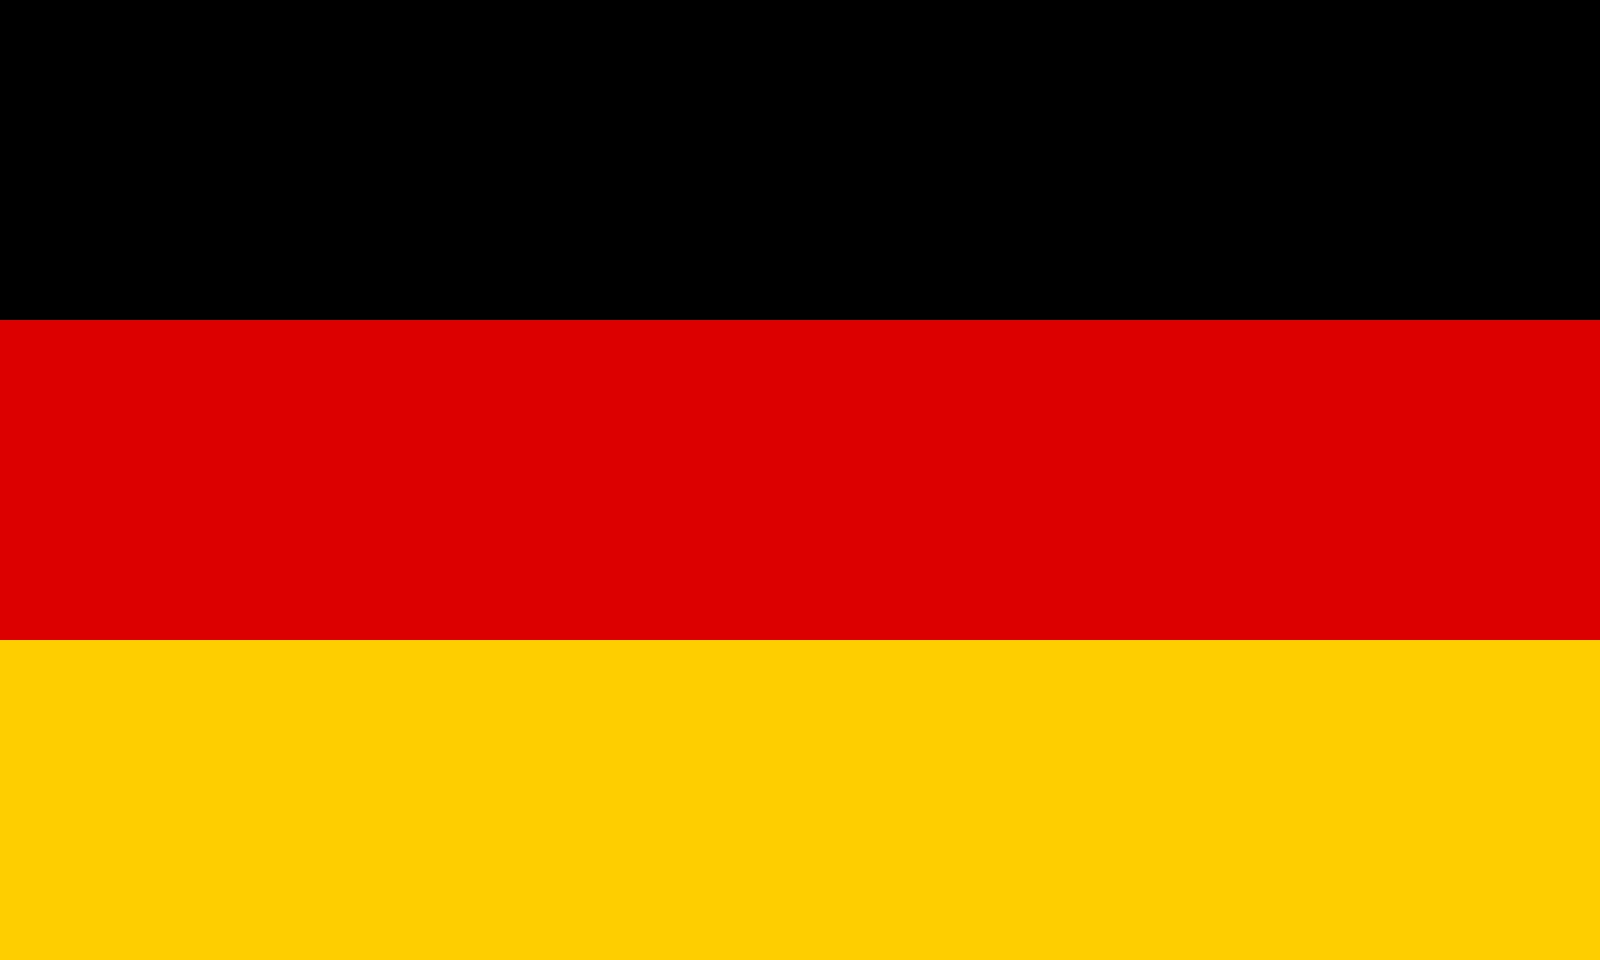 Bandeira da Alemanha.